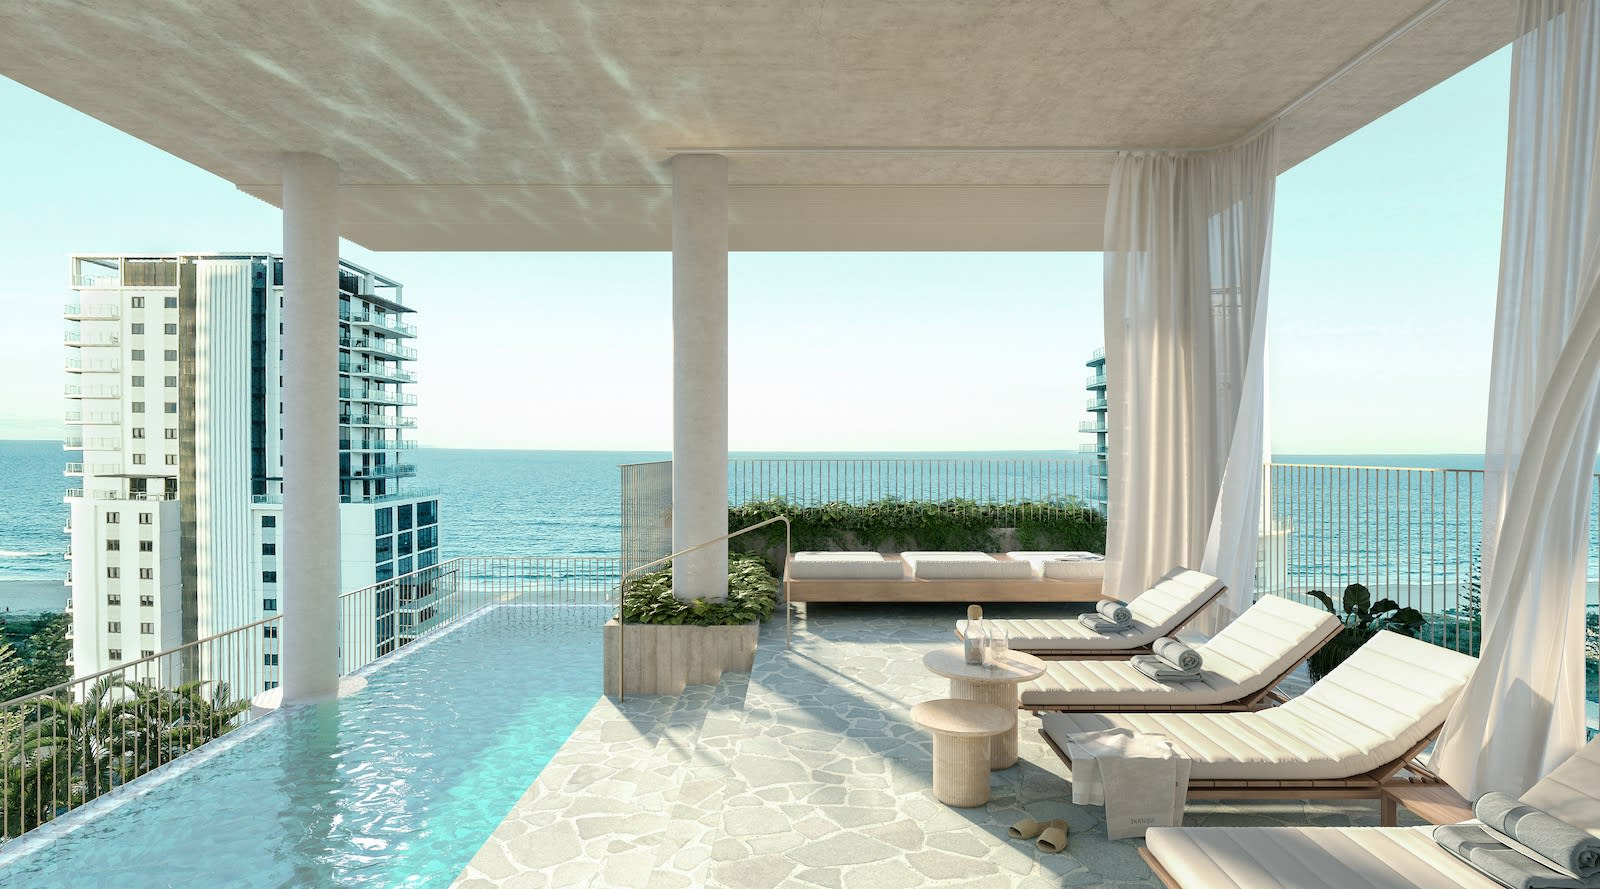 Take a look inside Bottega Group's $52 million Broadbeach apartment block 123OBR